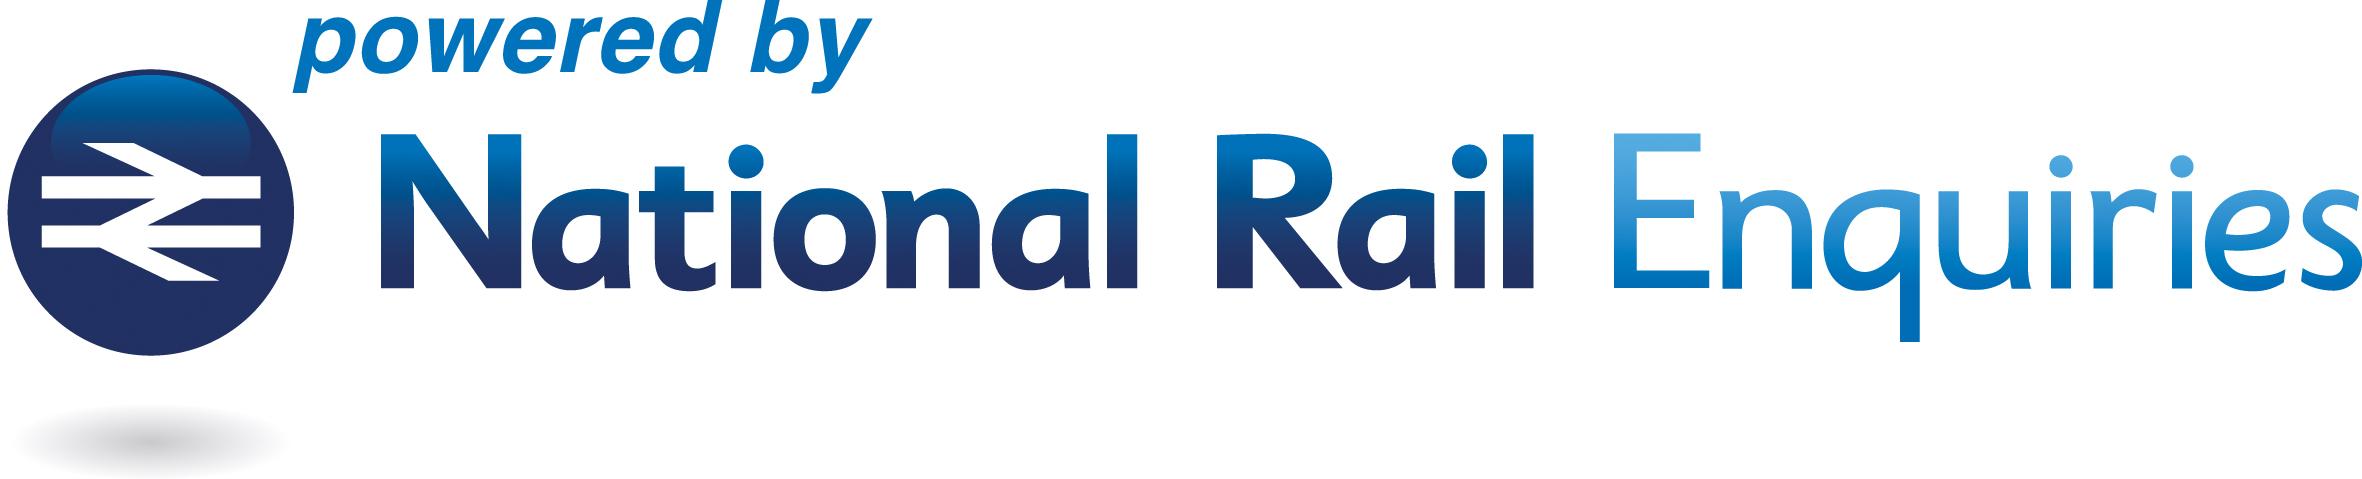 Powered by NRE logo